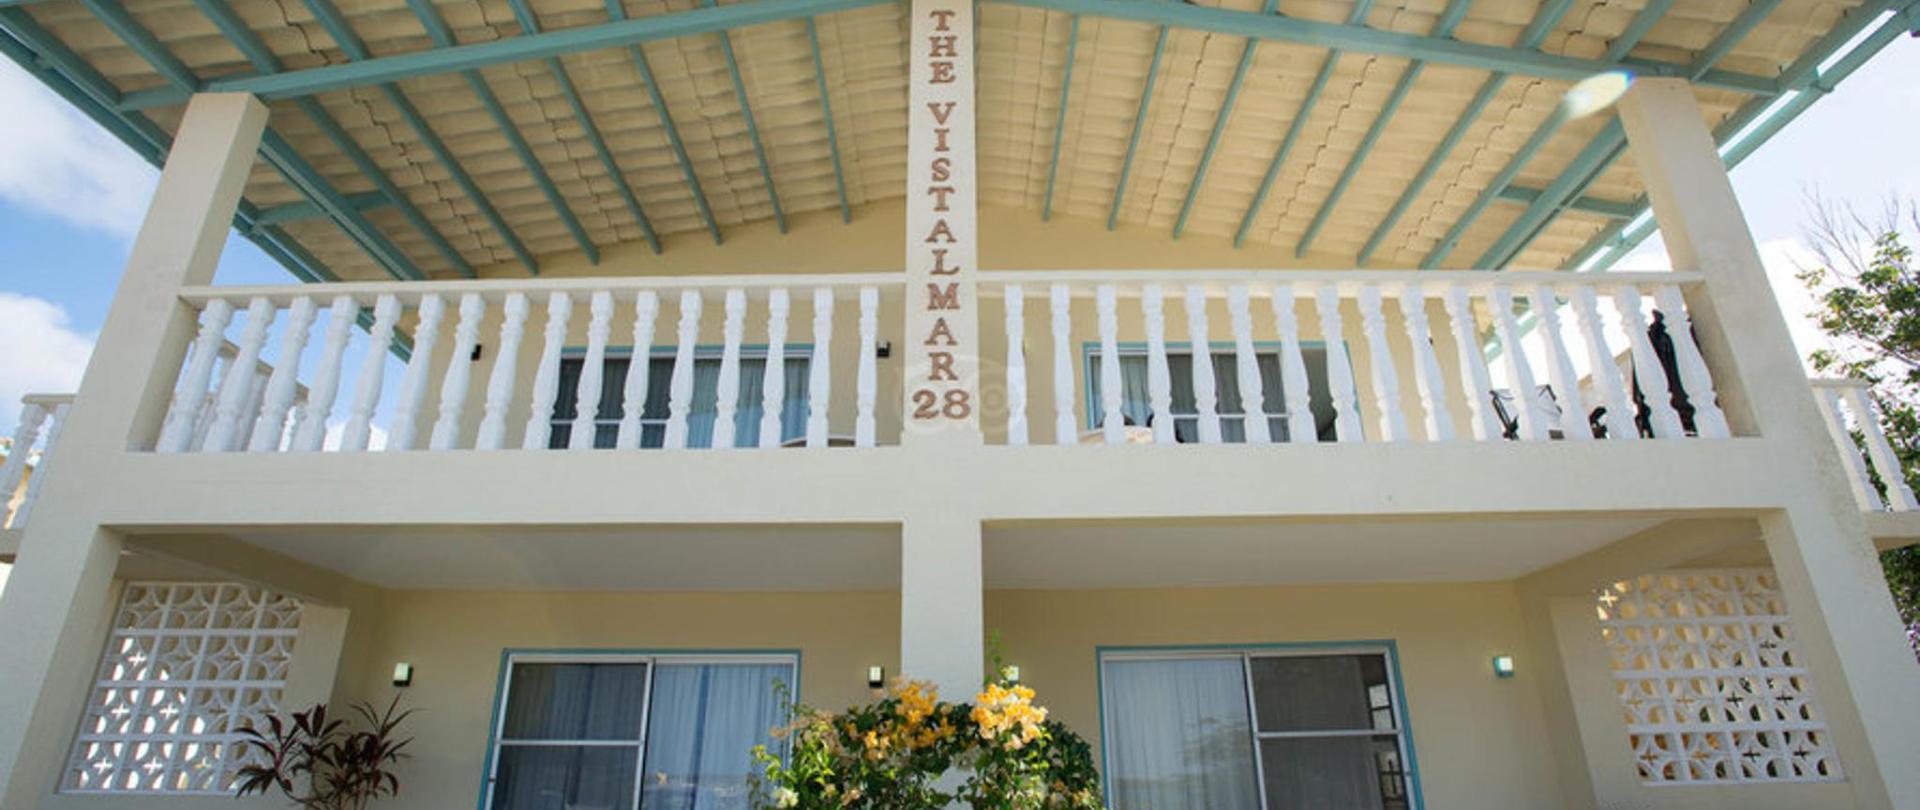 Front Building Vistalmar Aruba Accommodation.jpg